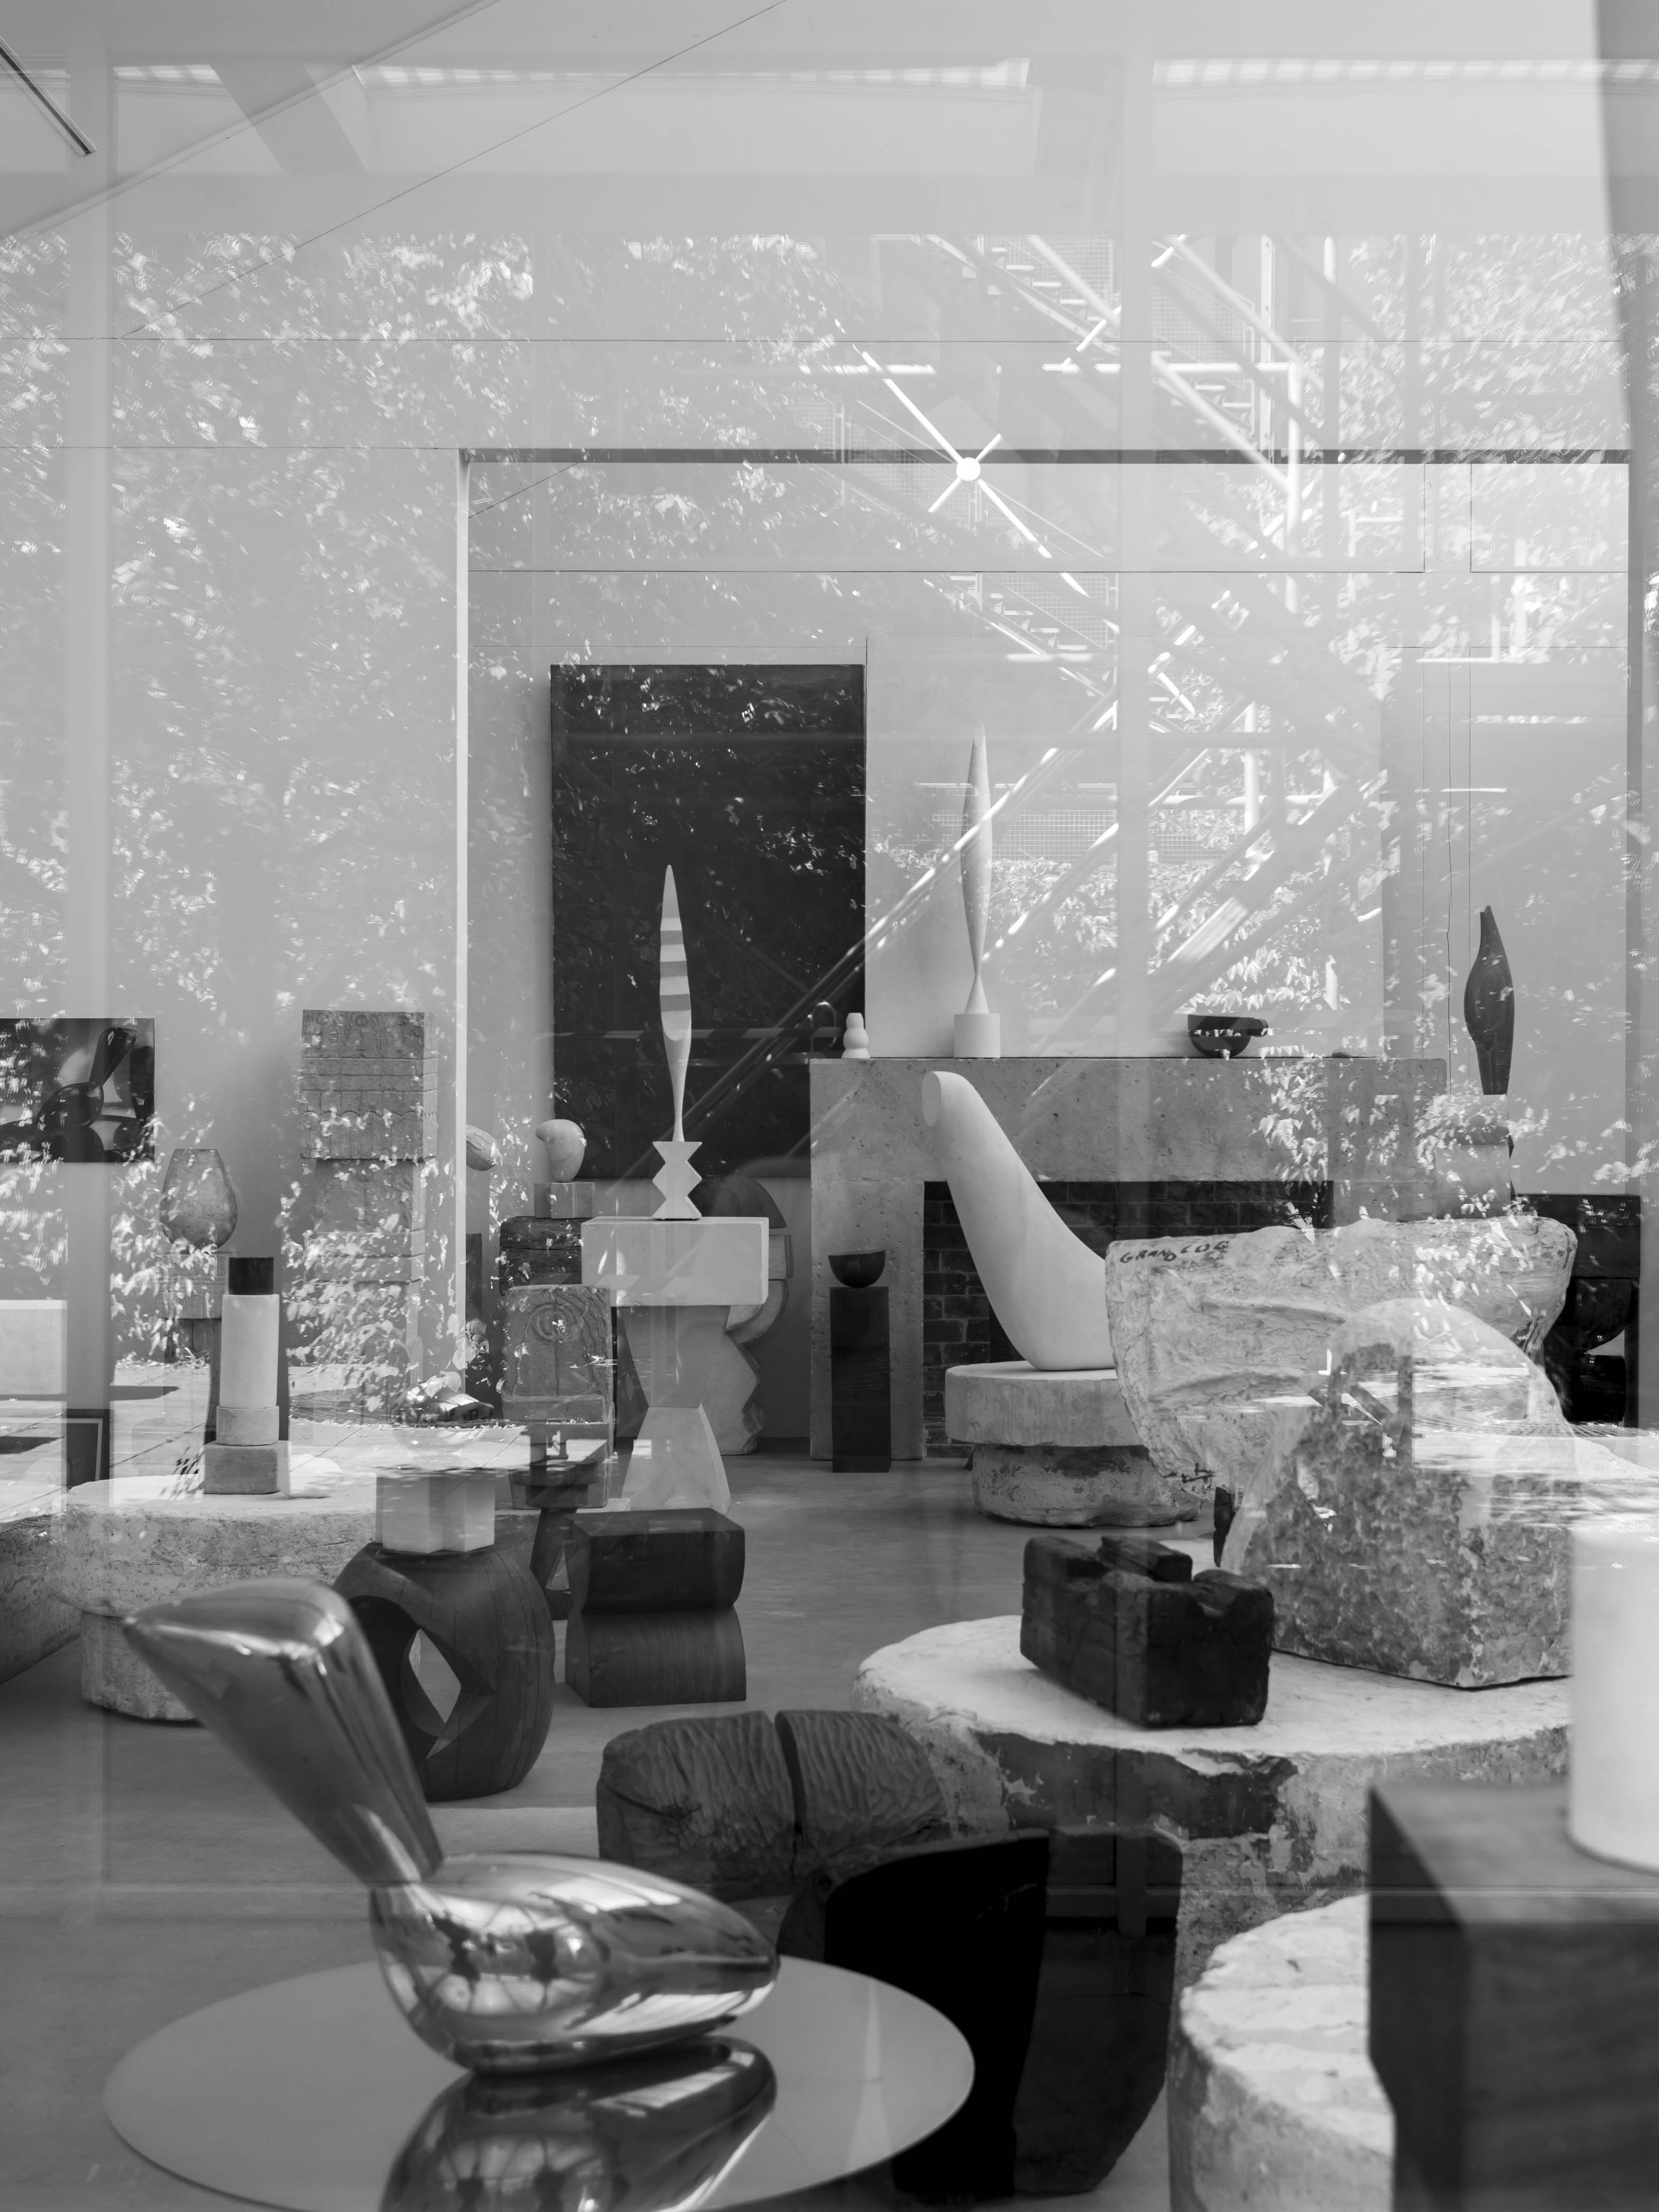 centrepompidou Brancusi 4